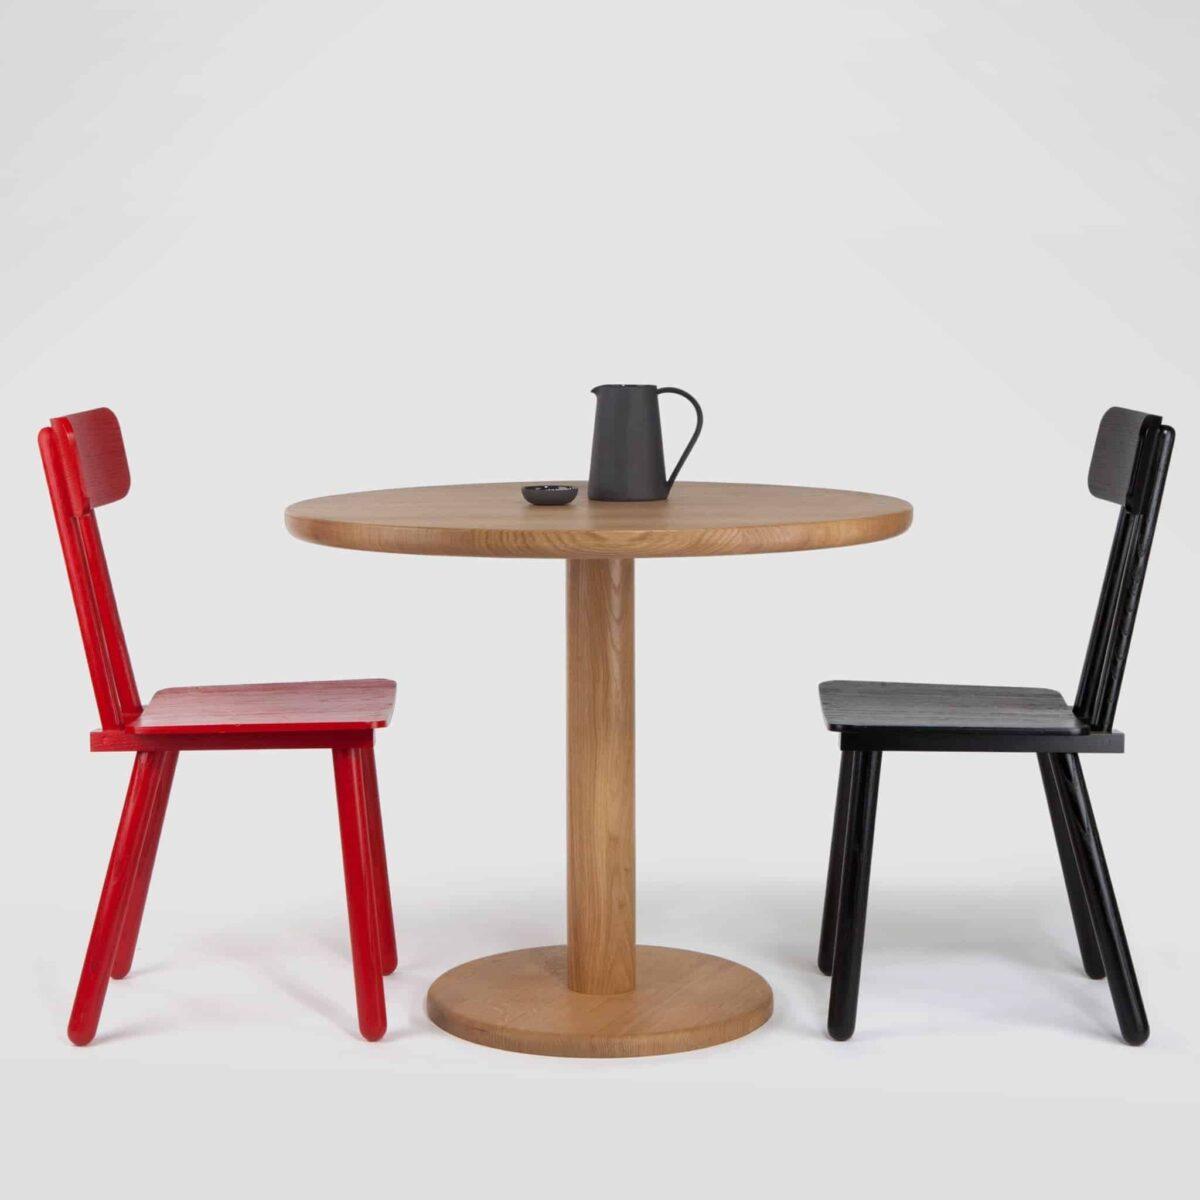 Pedestal Table One, Round